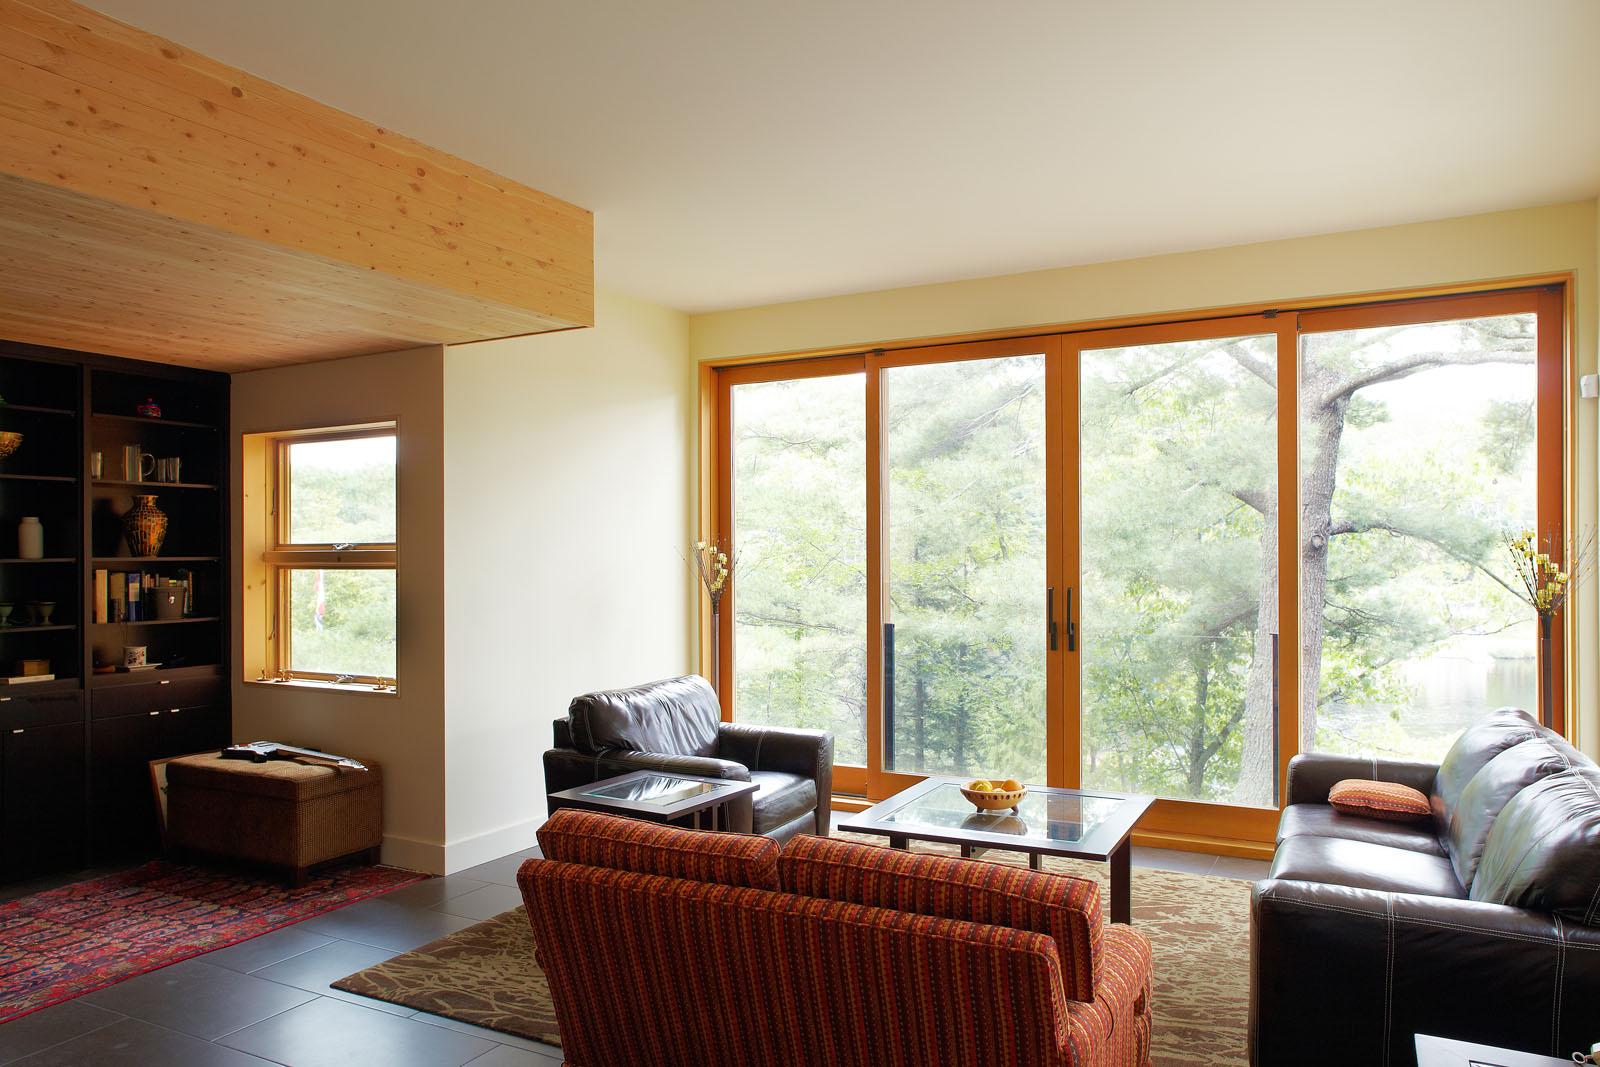 эко-дом от студии altius architecture